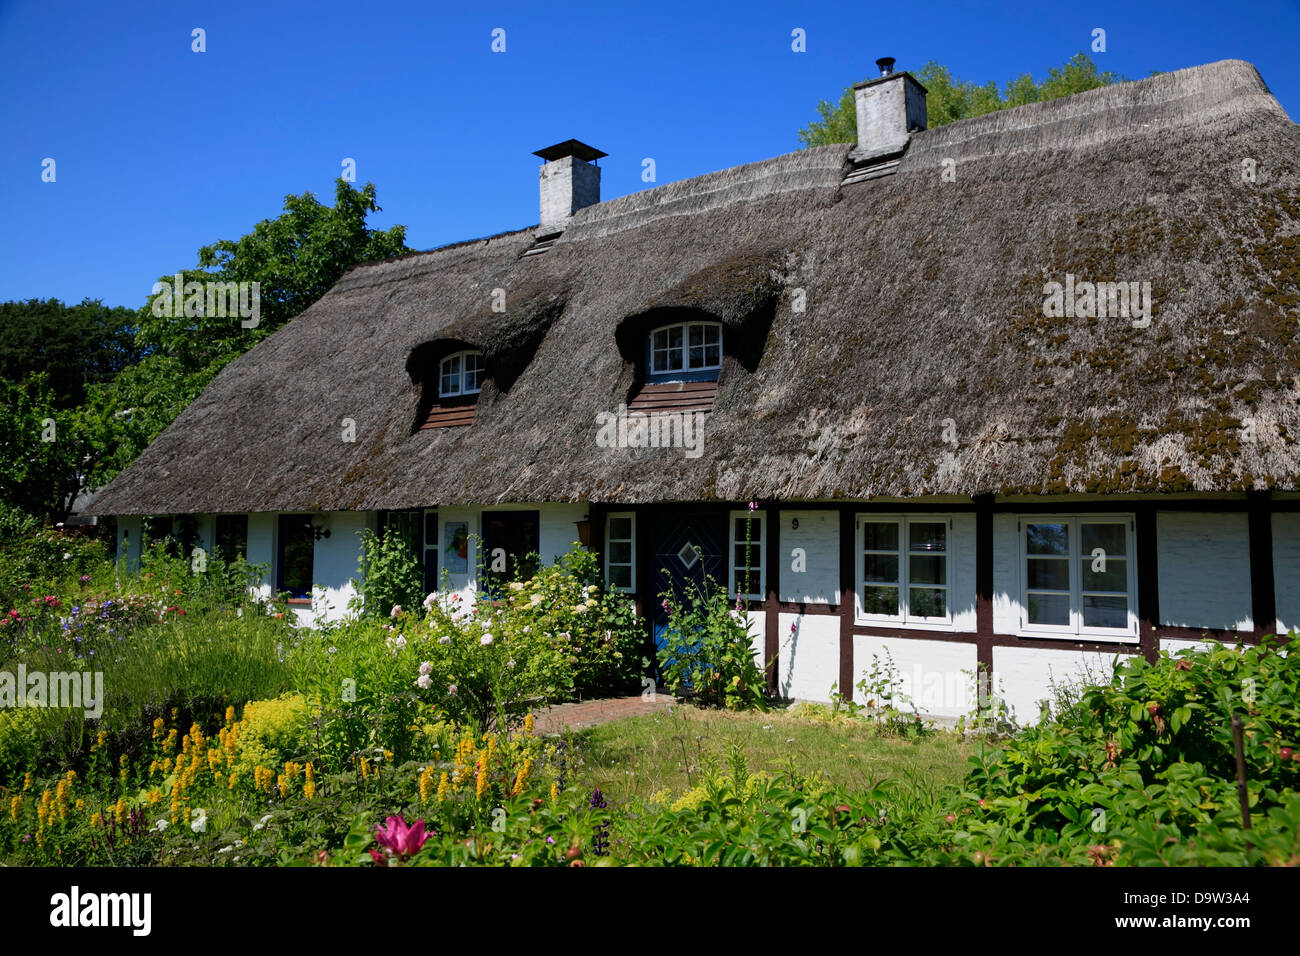 old thatched house in strande kiel bay schleswig holstein germany stock photo royalty free. Black Bedroom Furniture Sets. Home Design Ideas